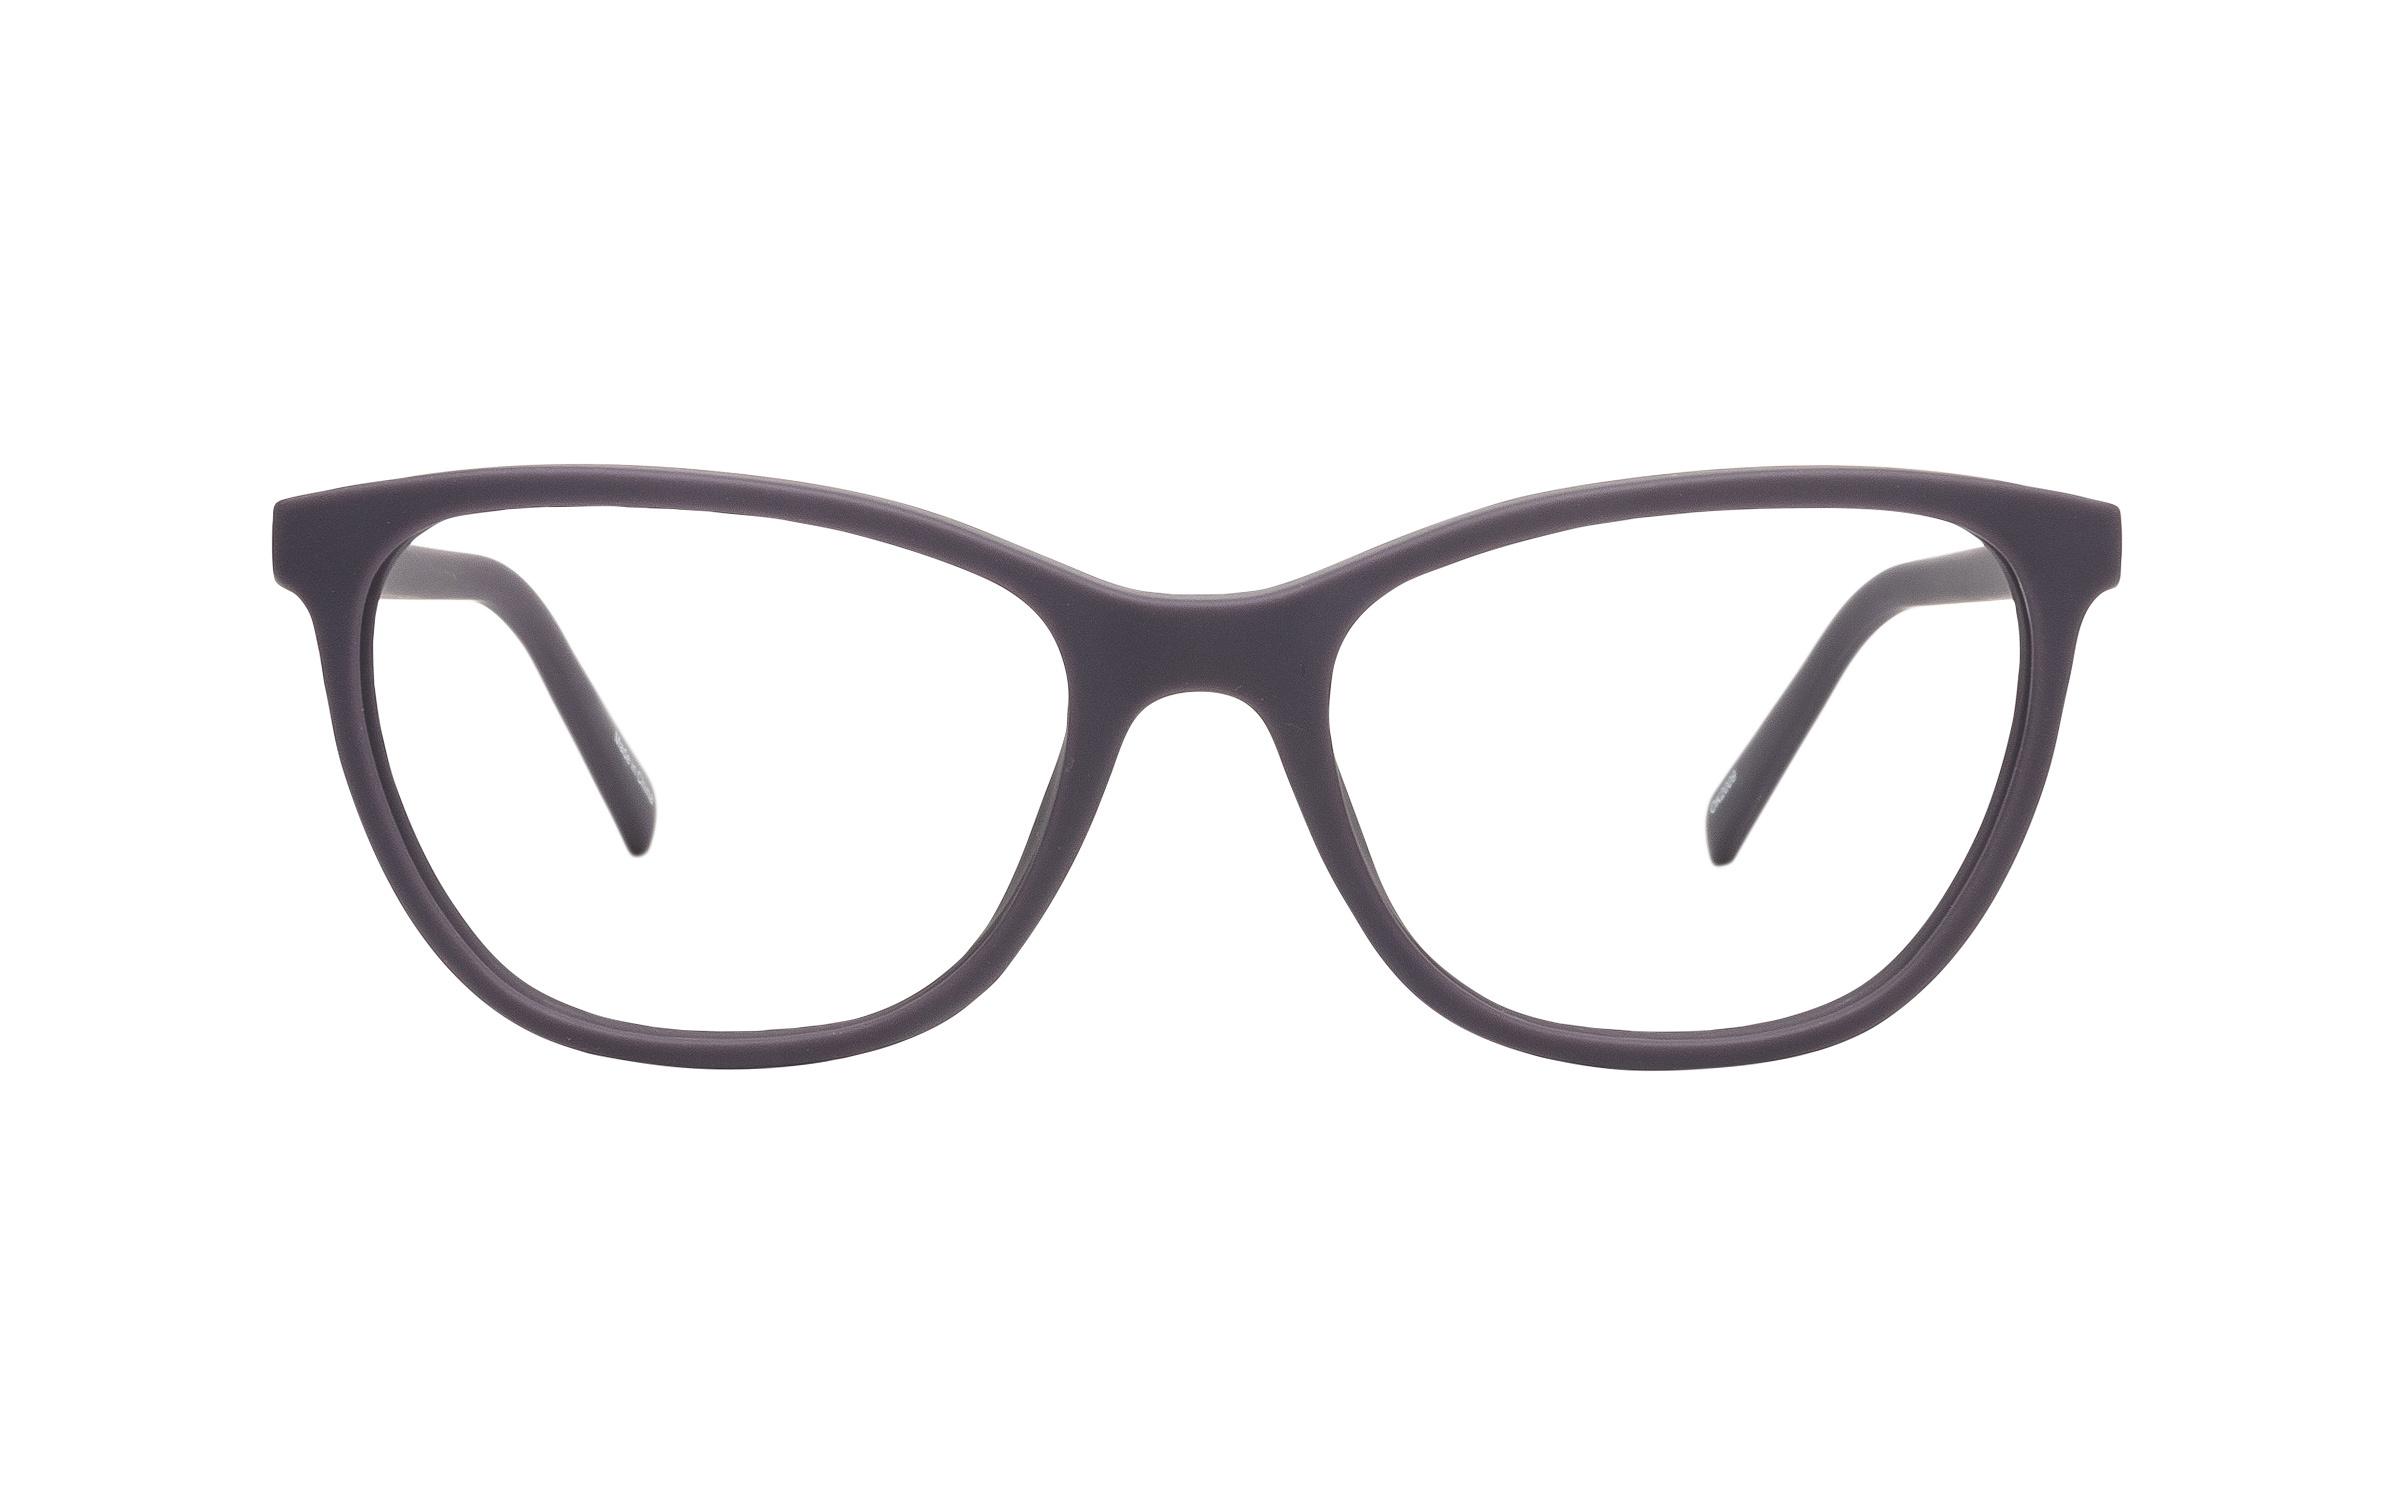 ClearlyBasics Reincarnate Maleo O2O1908 C03 (52) Eyeglasses and Frame in Grey - Online Coastal